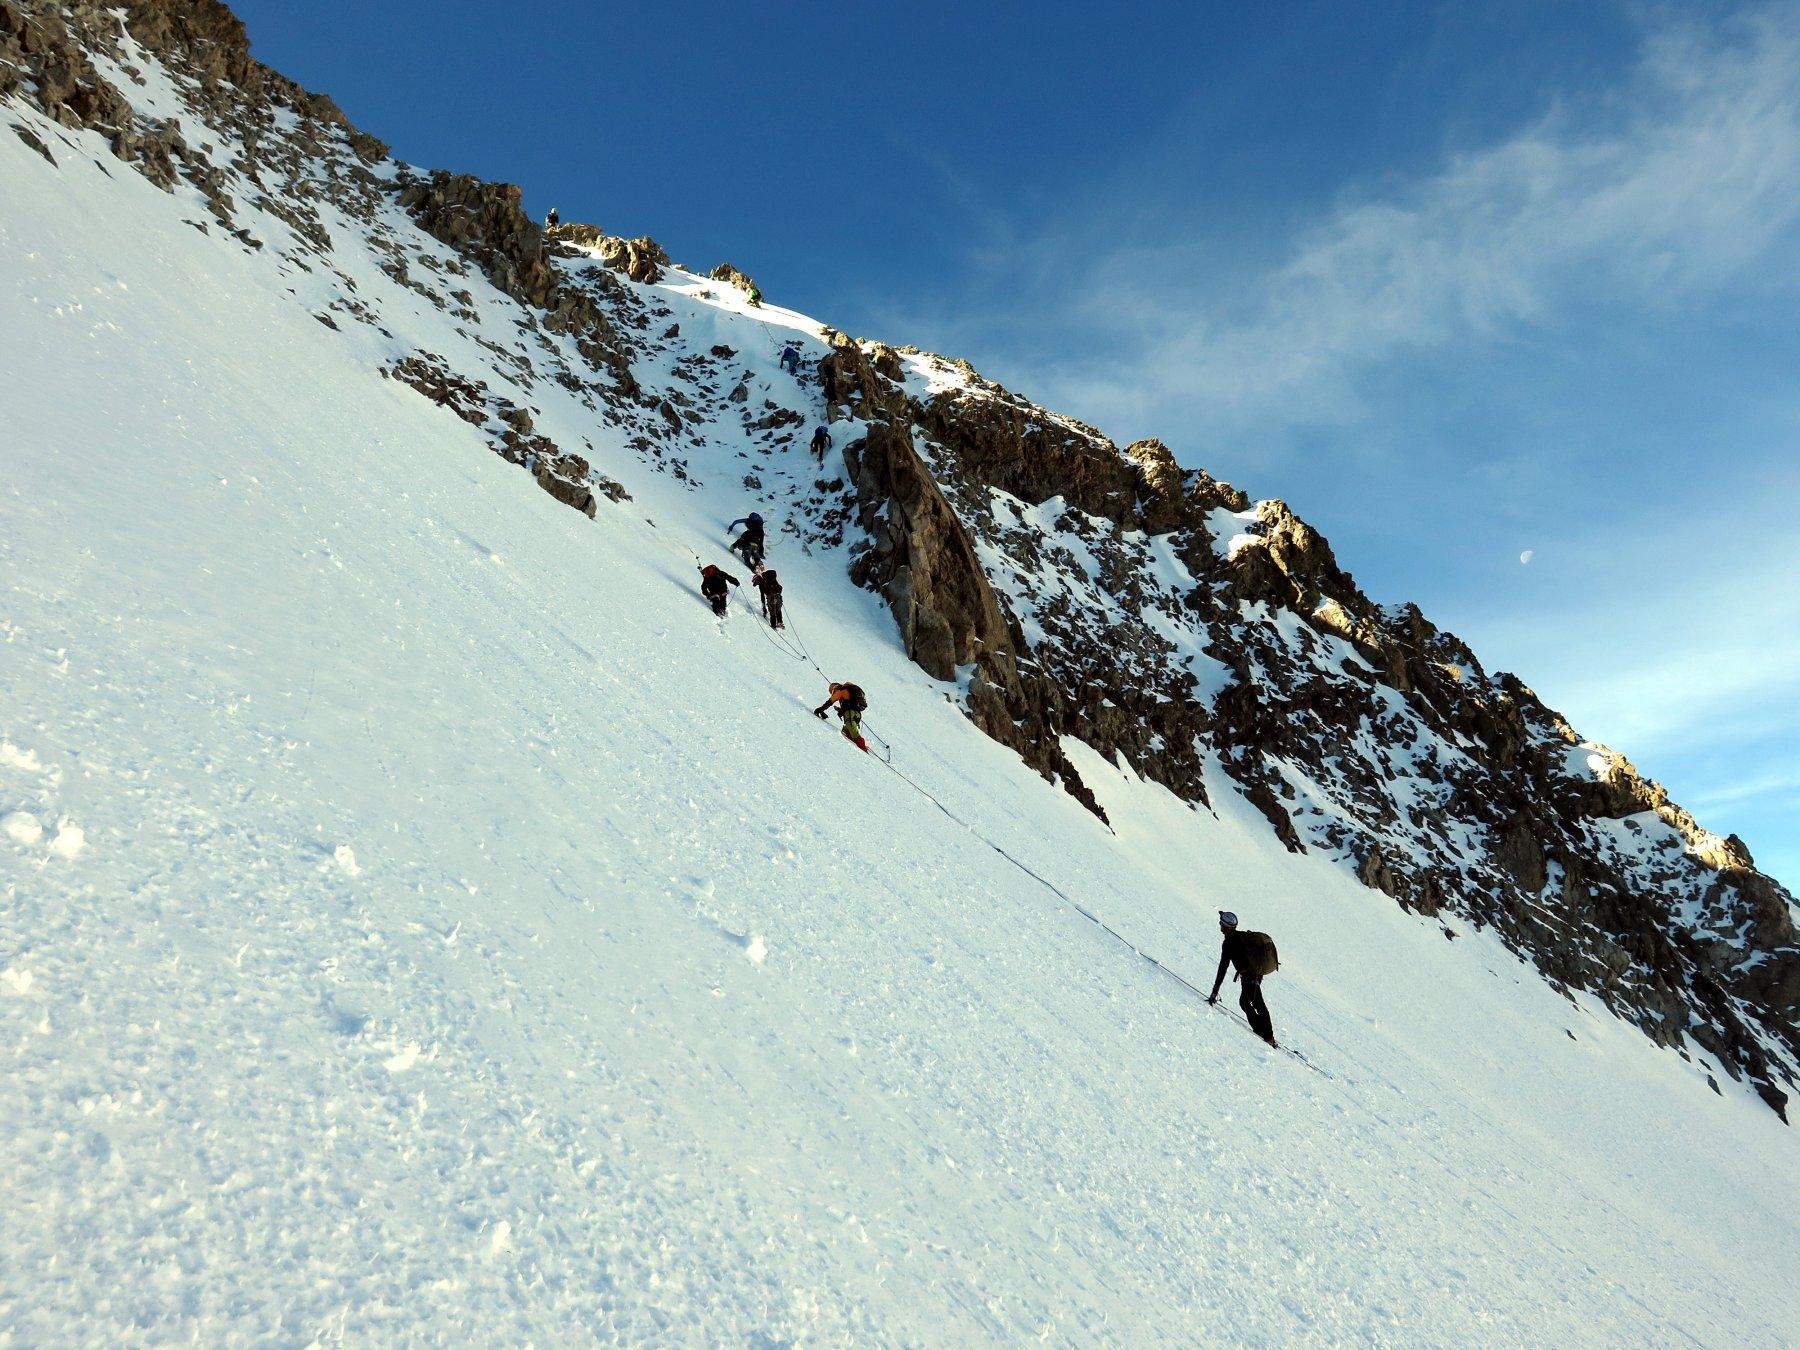 Pilatte (Pointes de la) Via Normale da La Berarde per il Glacier de la Pilatte 2019-06-23